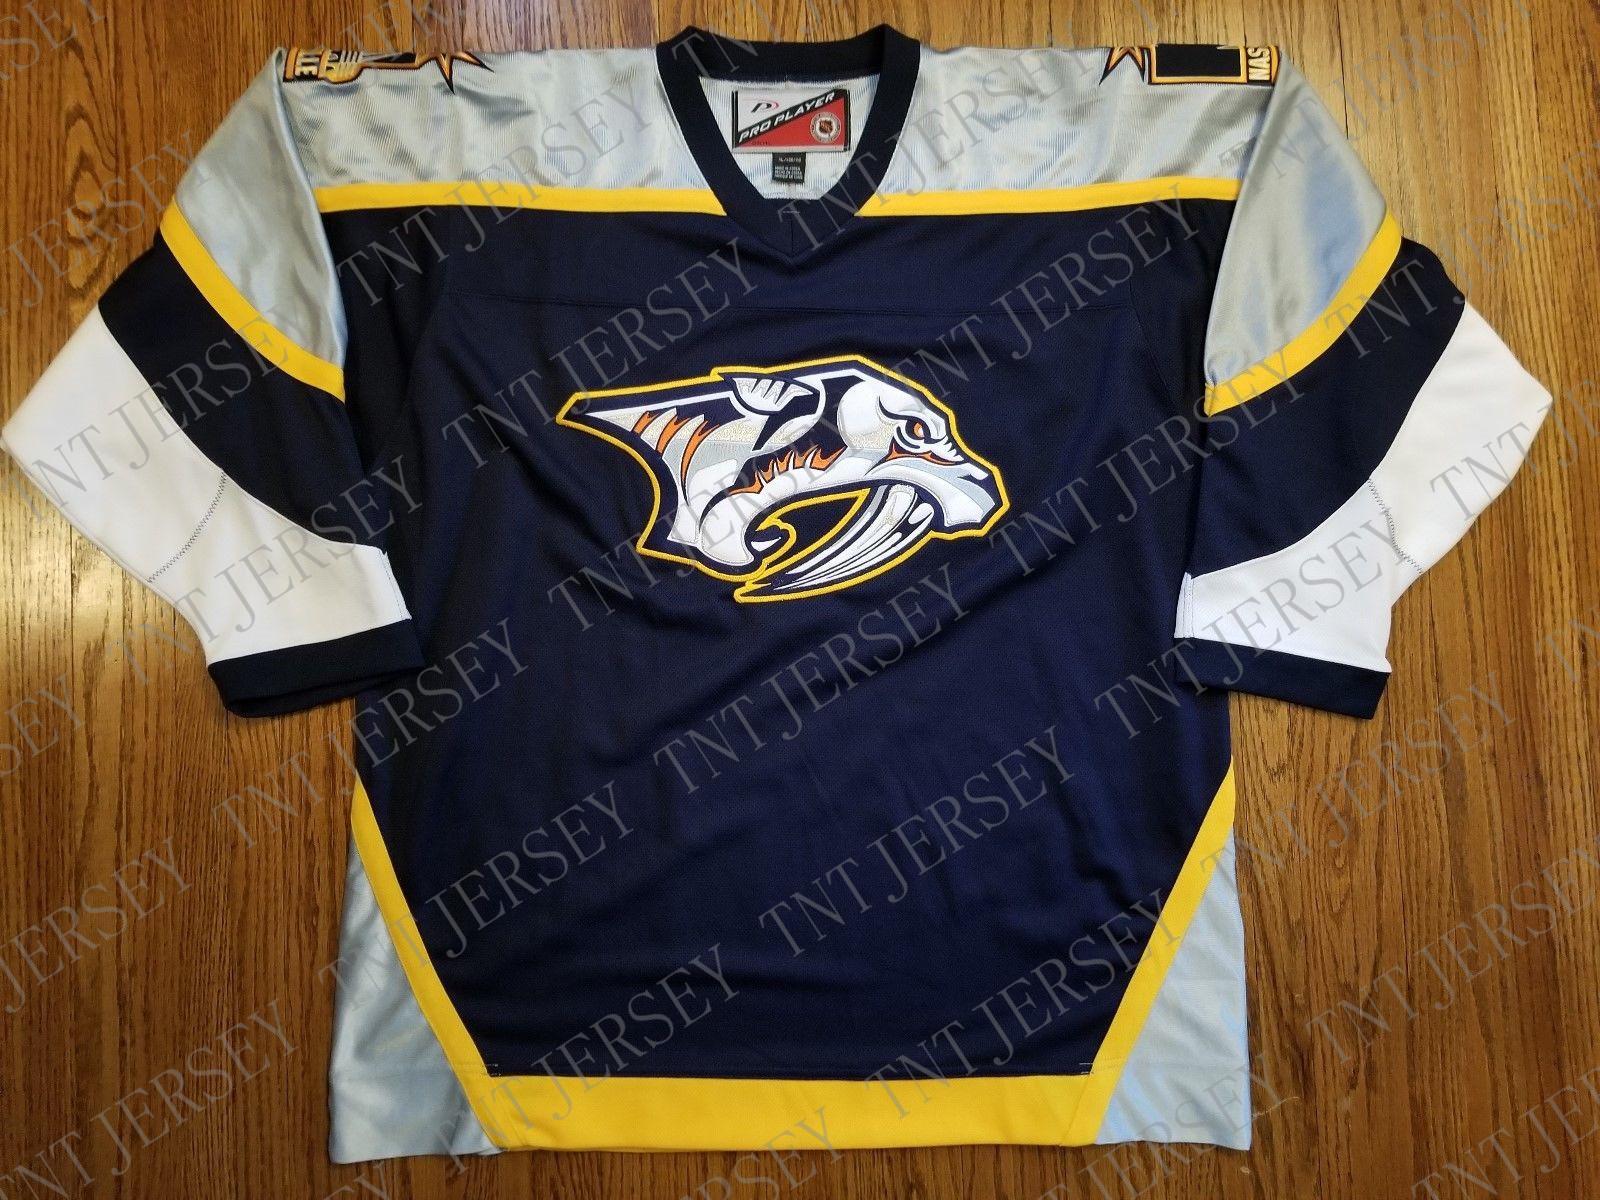 Cheap custom Nashville Predators Vintage Preds Pro Player Jersey 1999/2000  2 Stitched Retro Hockey Jersey Customize any name number XS-5XL